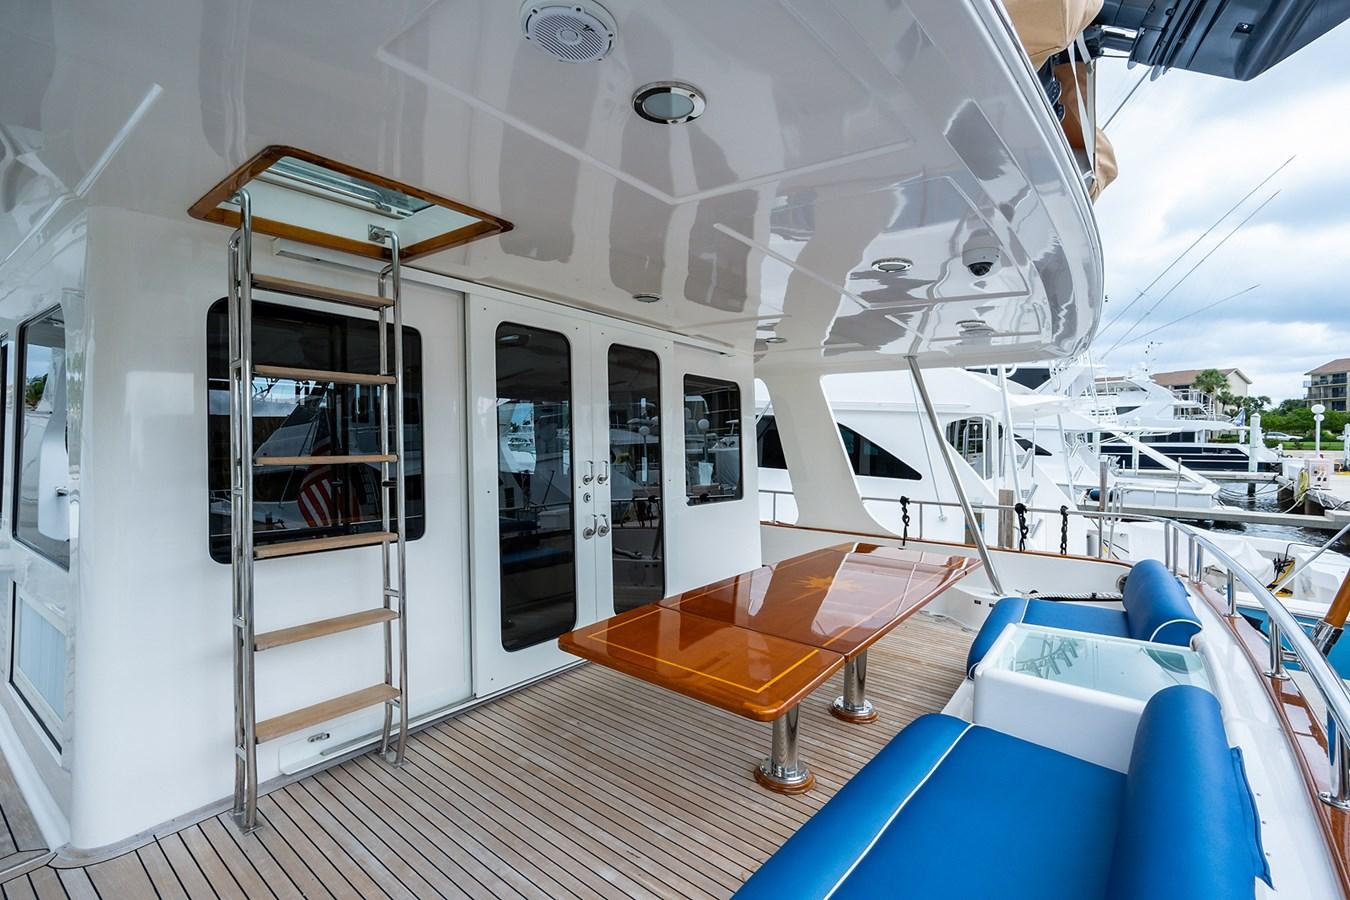 Tout Va Bien_Aft Deck4 2005 GRAND BANKS 64 Aleutian RP Motor Yacht 2726099